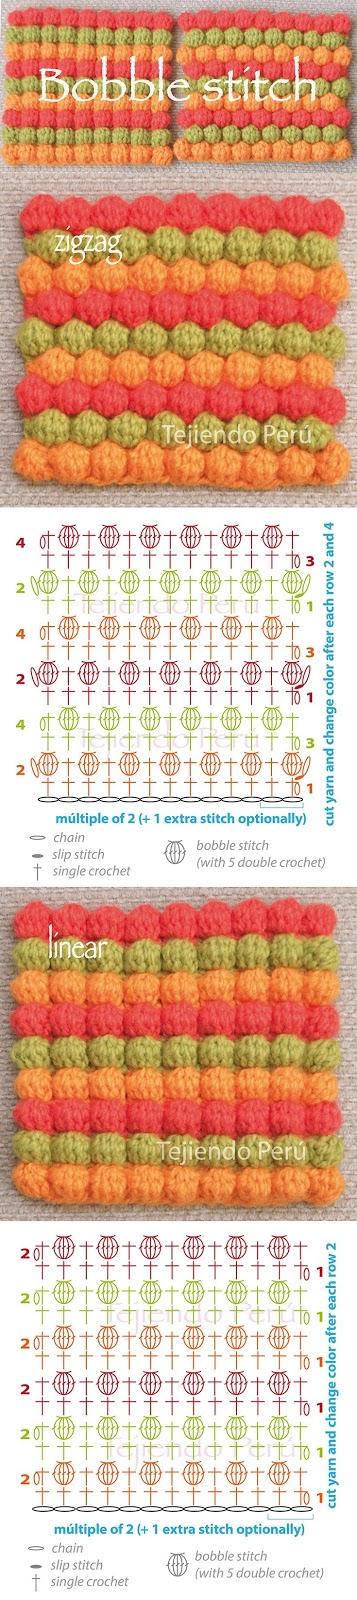 Ergahandmade crochet stitches diagrams httpergahandmadespot201506crochet stitchesml via httptejiendoperu httpsyoutubeuseresperosassubconfirmation1 ccuart Choice Image